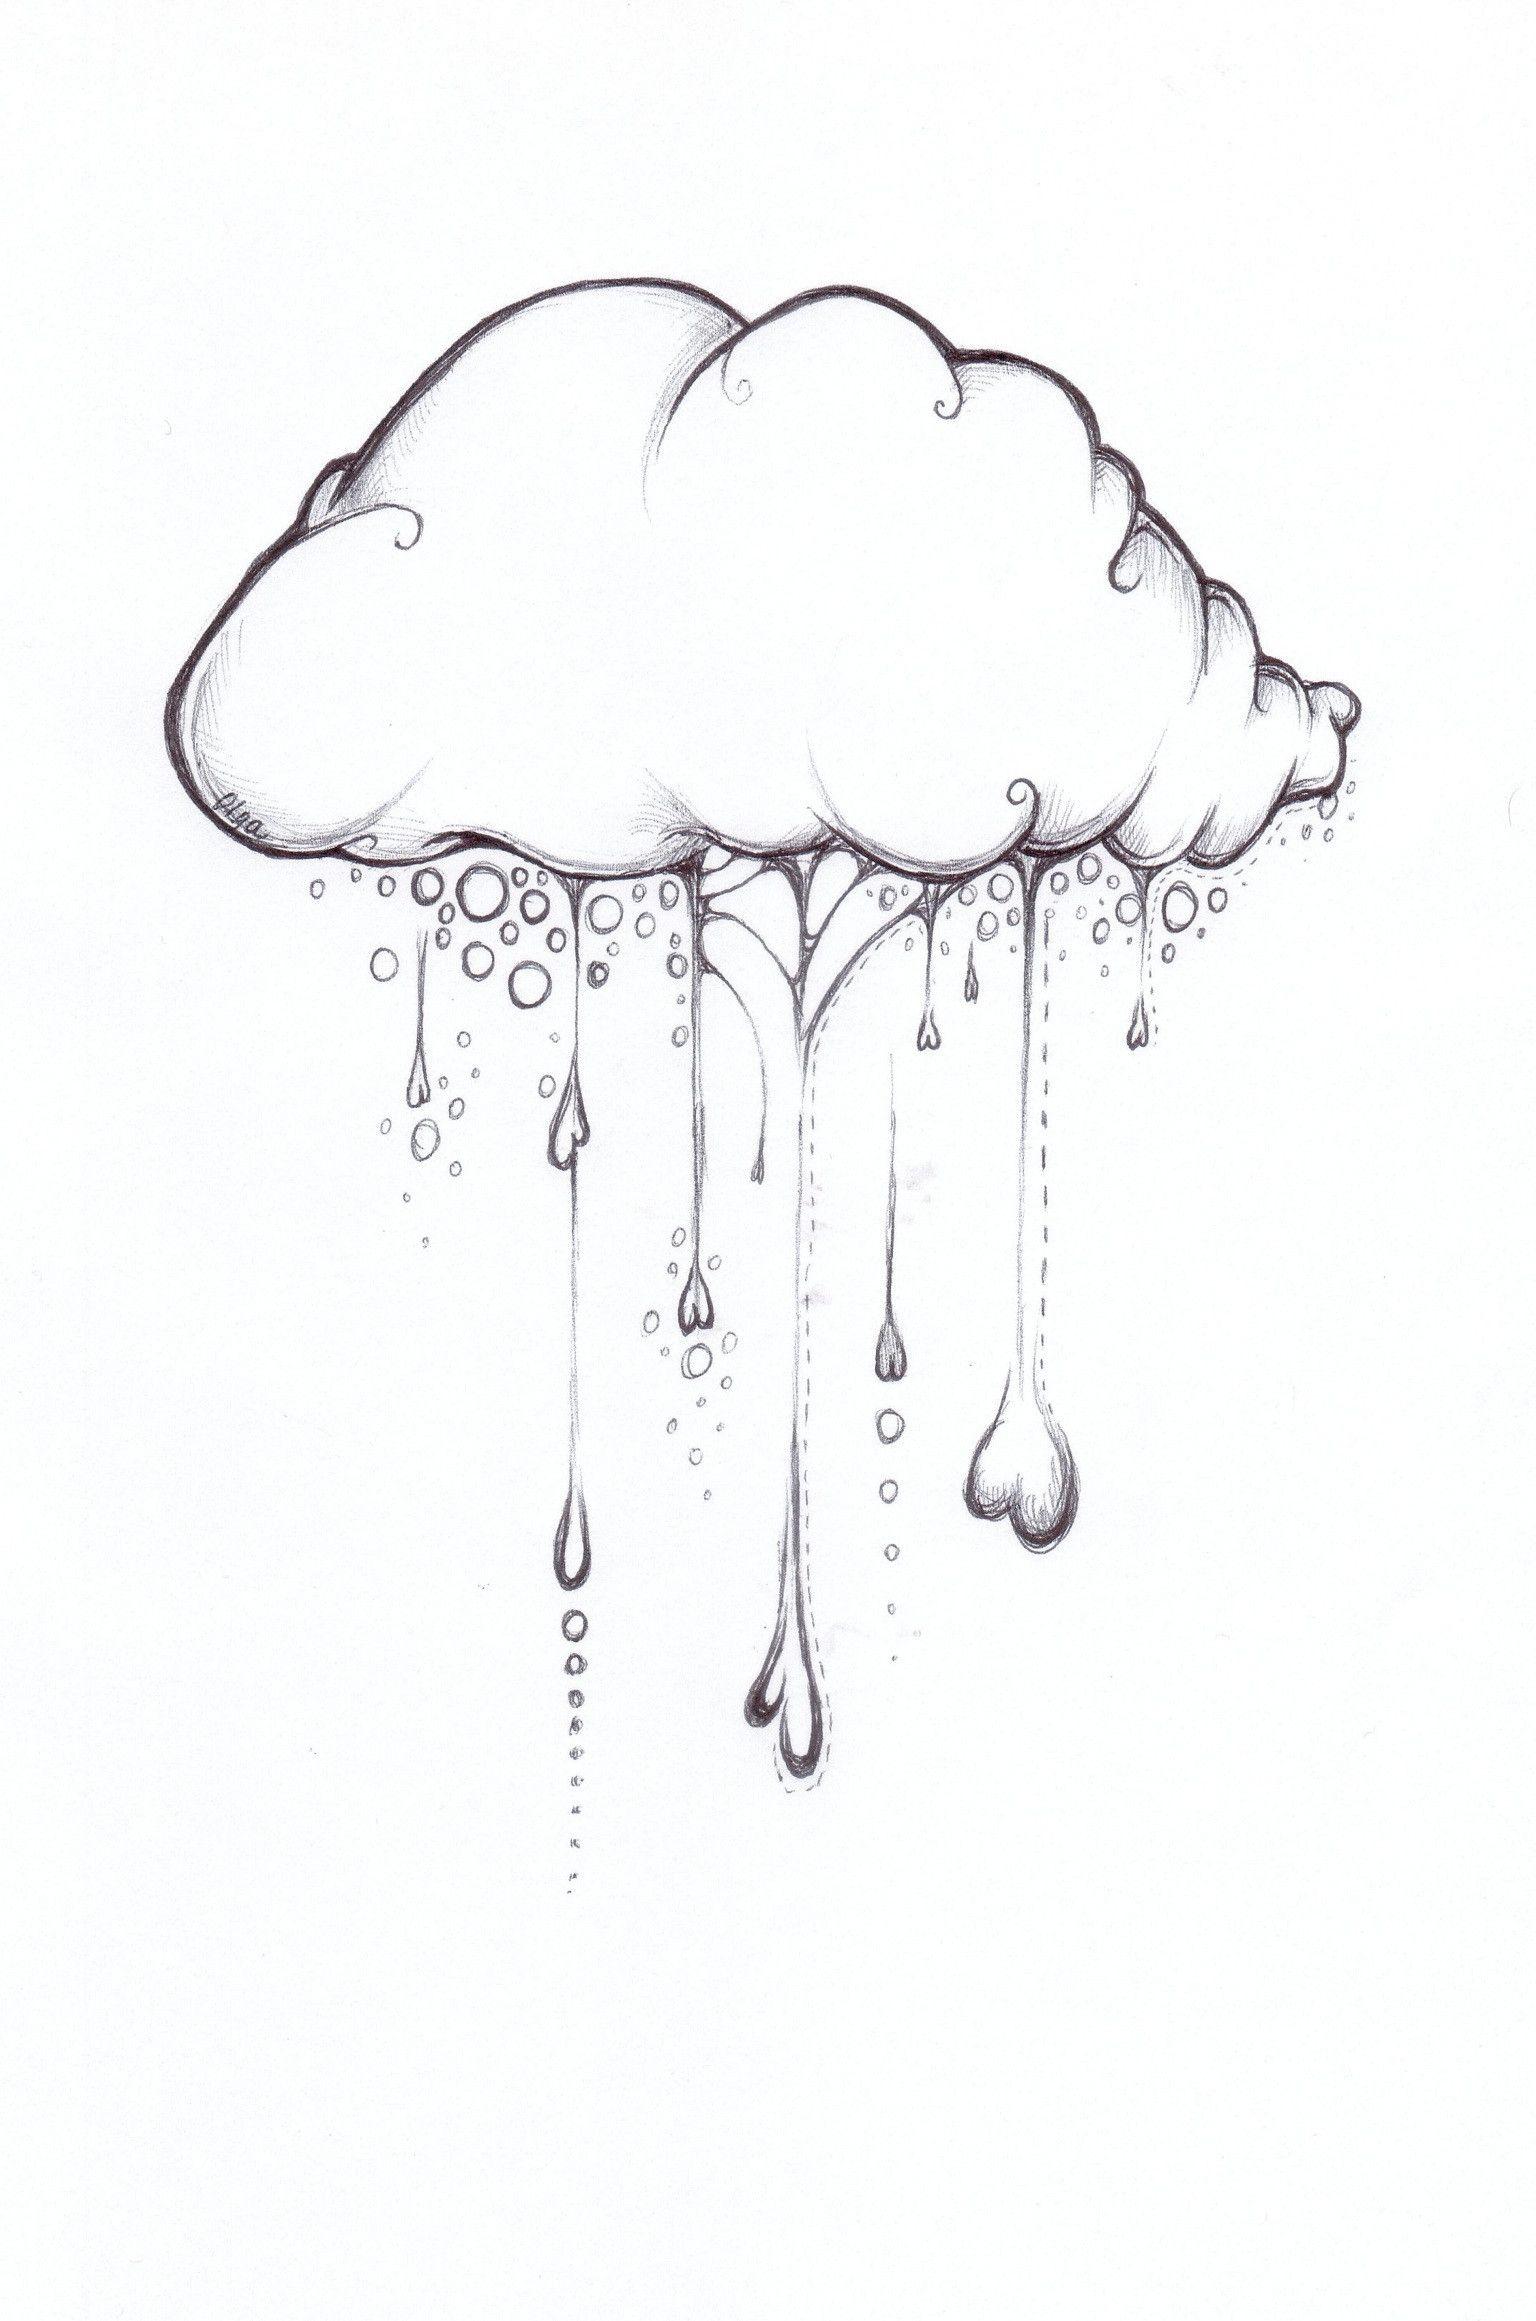 Cloud Pencil Drawing : cloud, pencil, drawing, Cloud, Doodle, Imgur, Pencil, Drawings,, Drawings